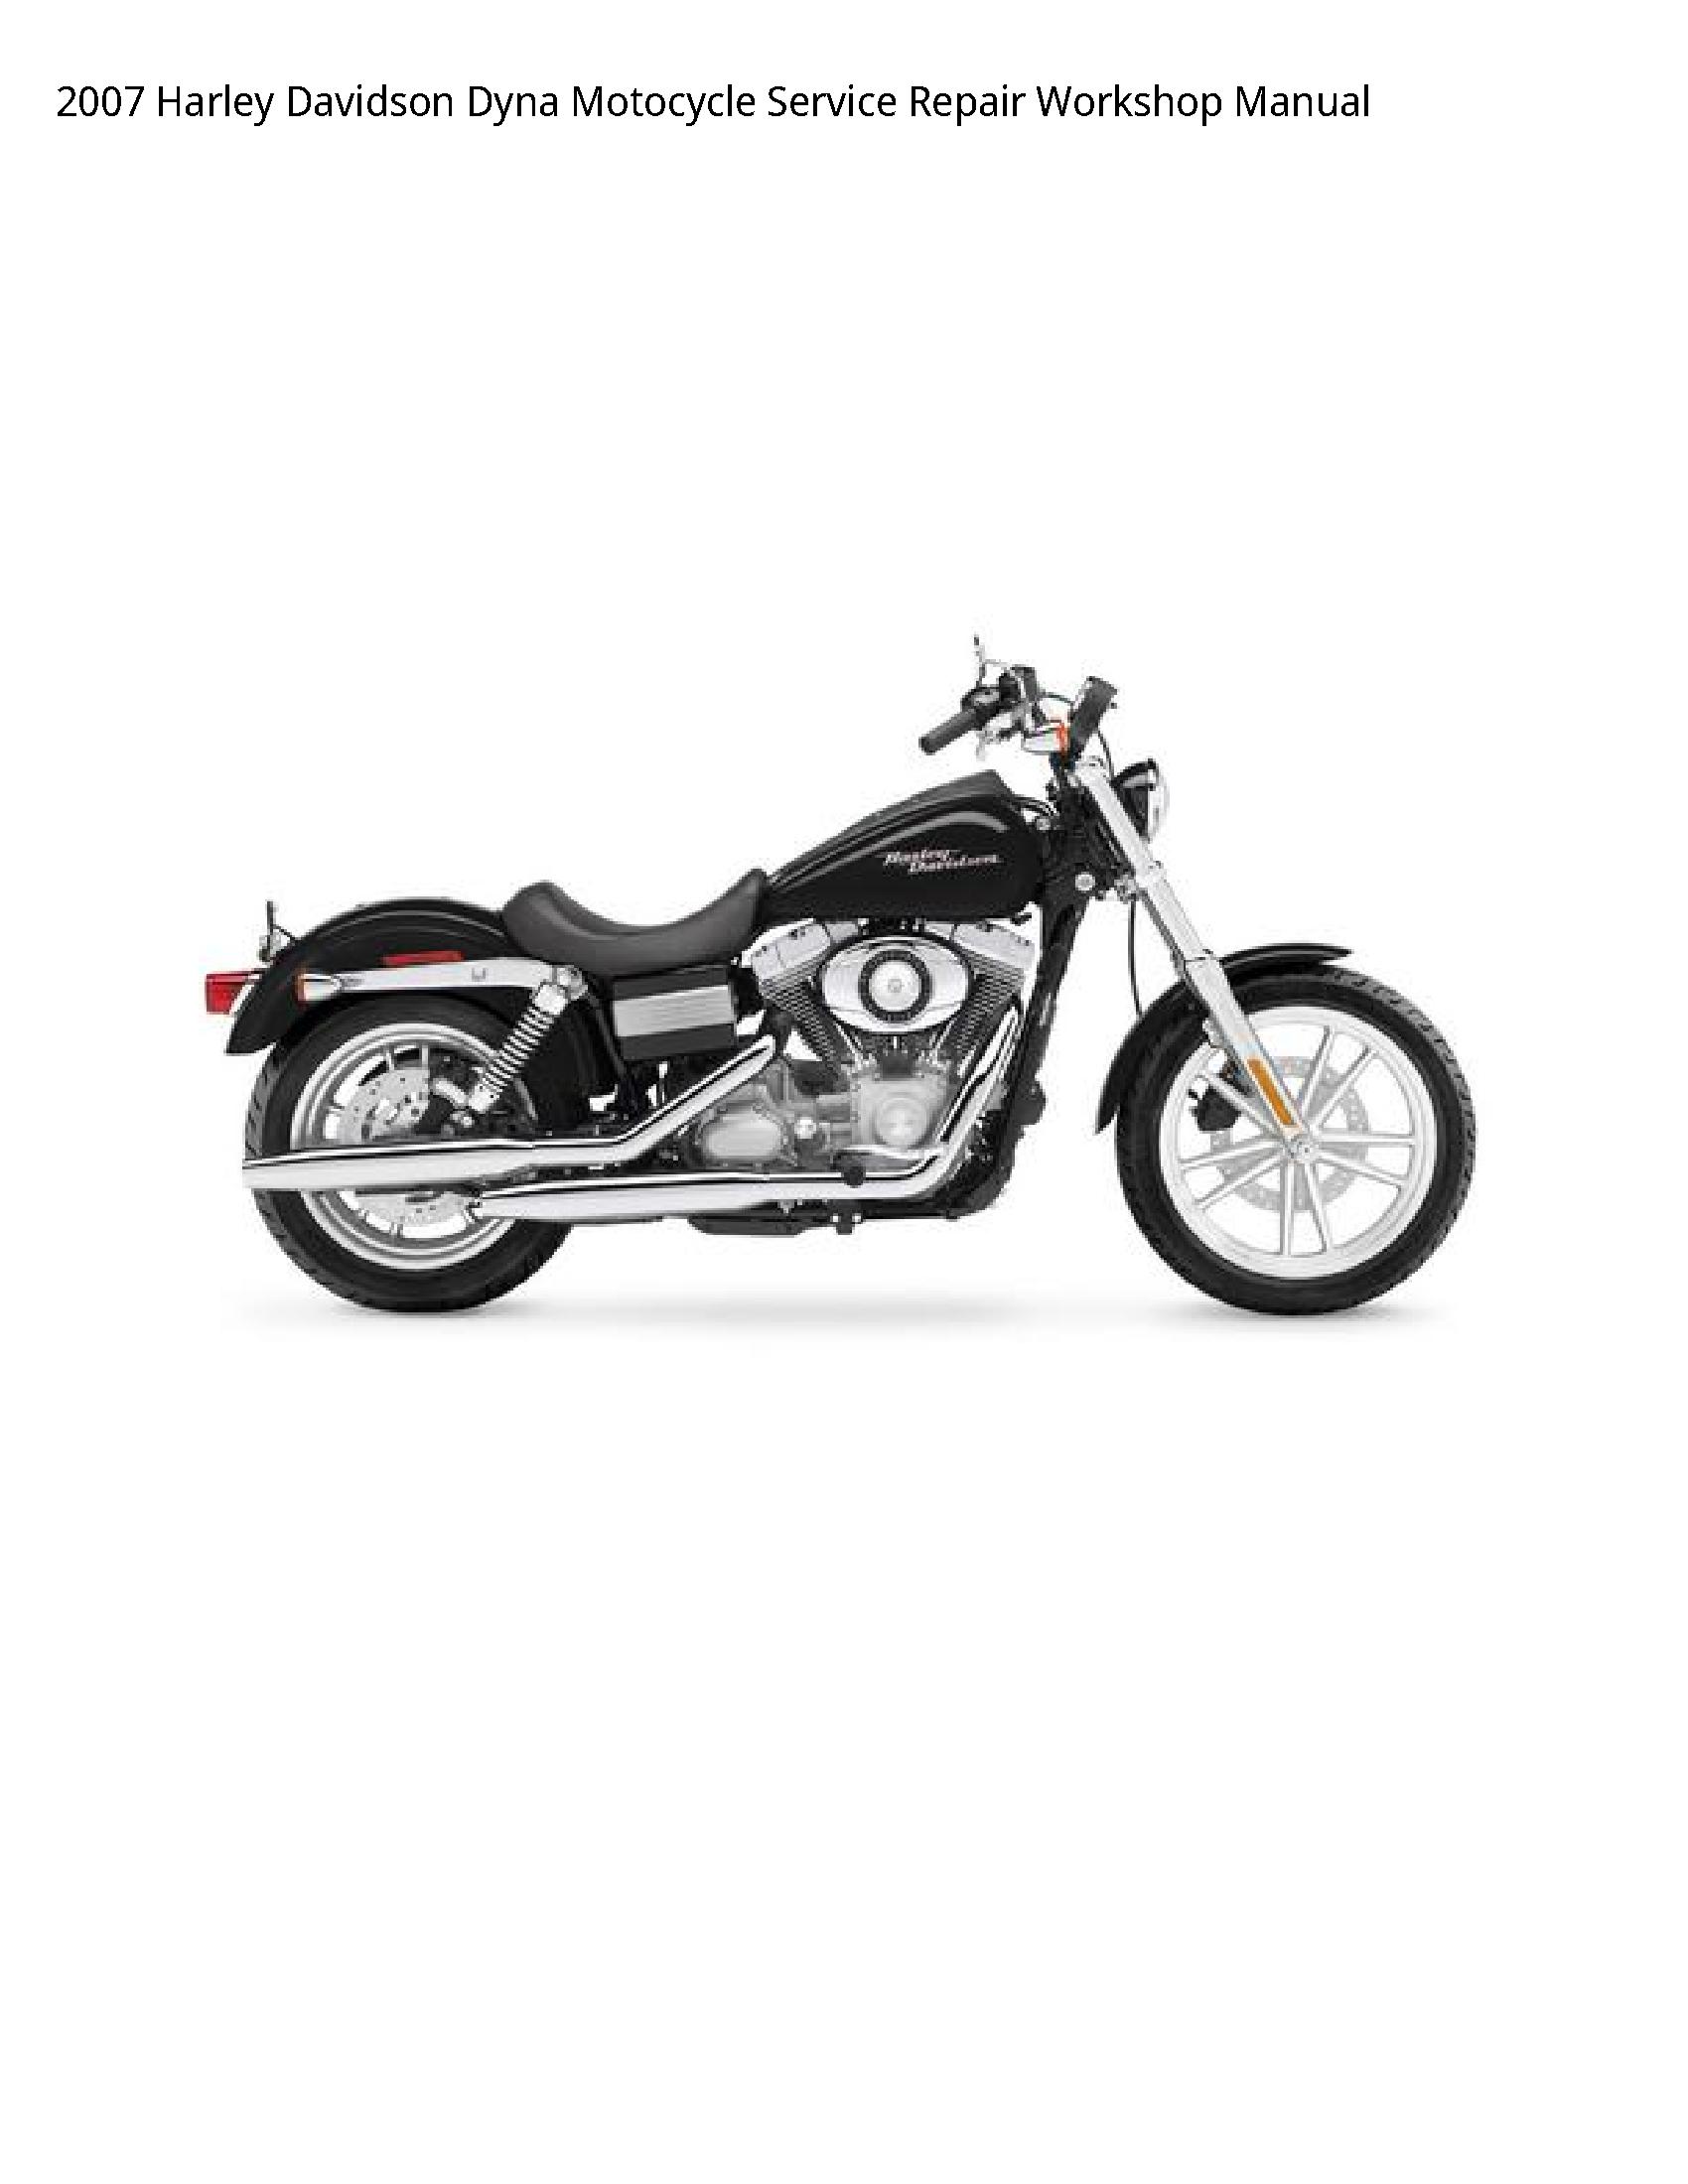 Harley Davidson Dyna Motocycle manual